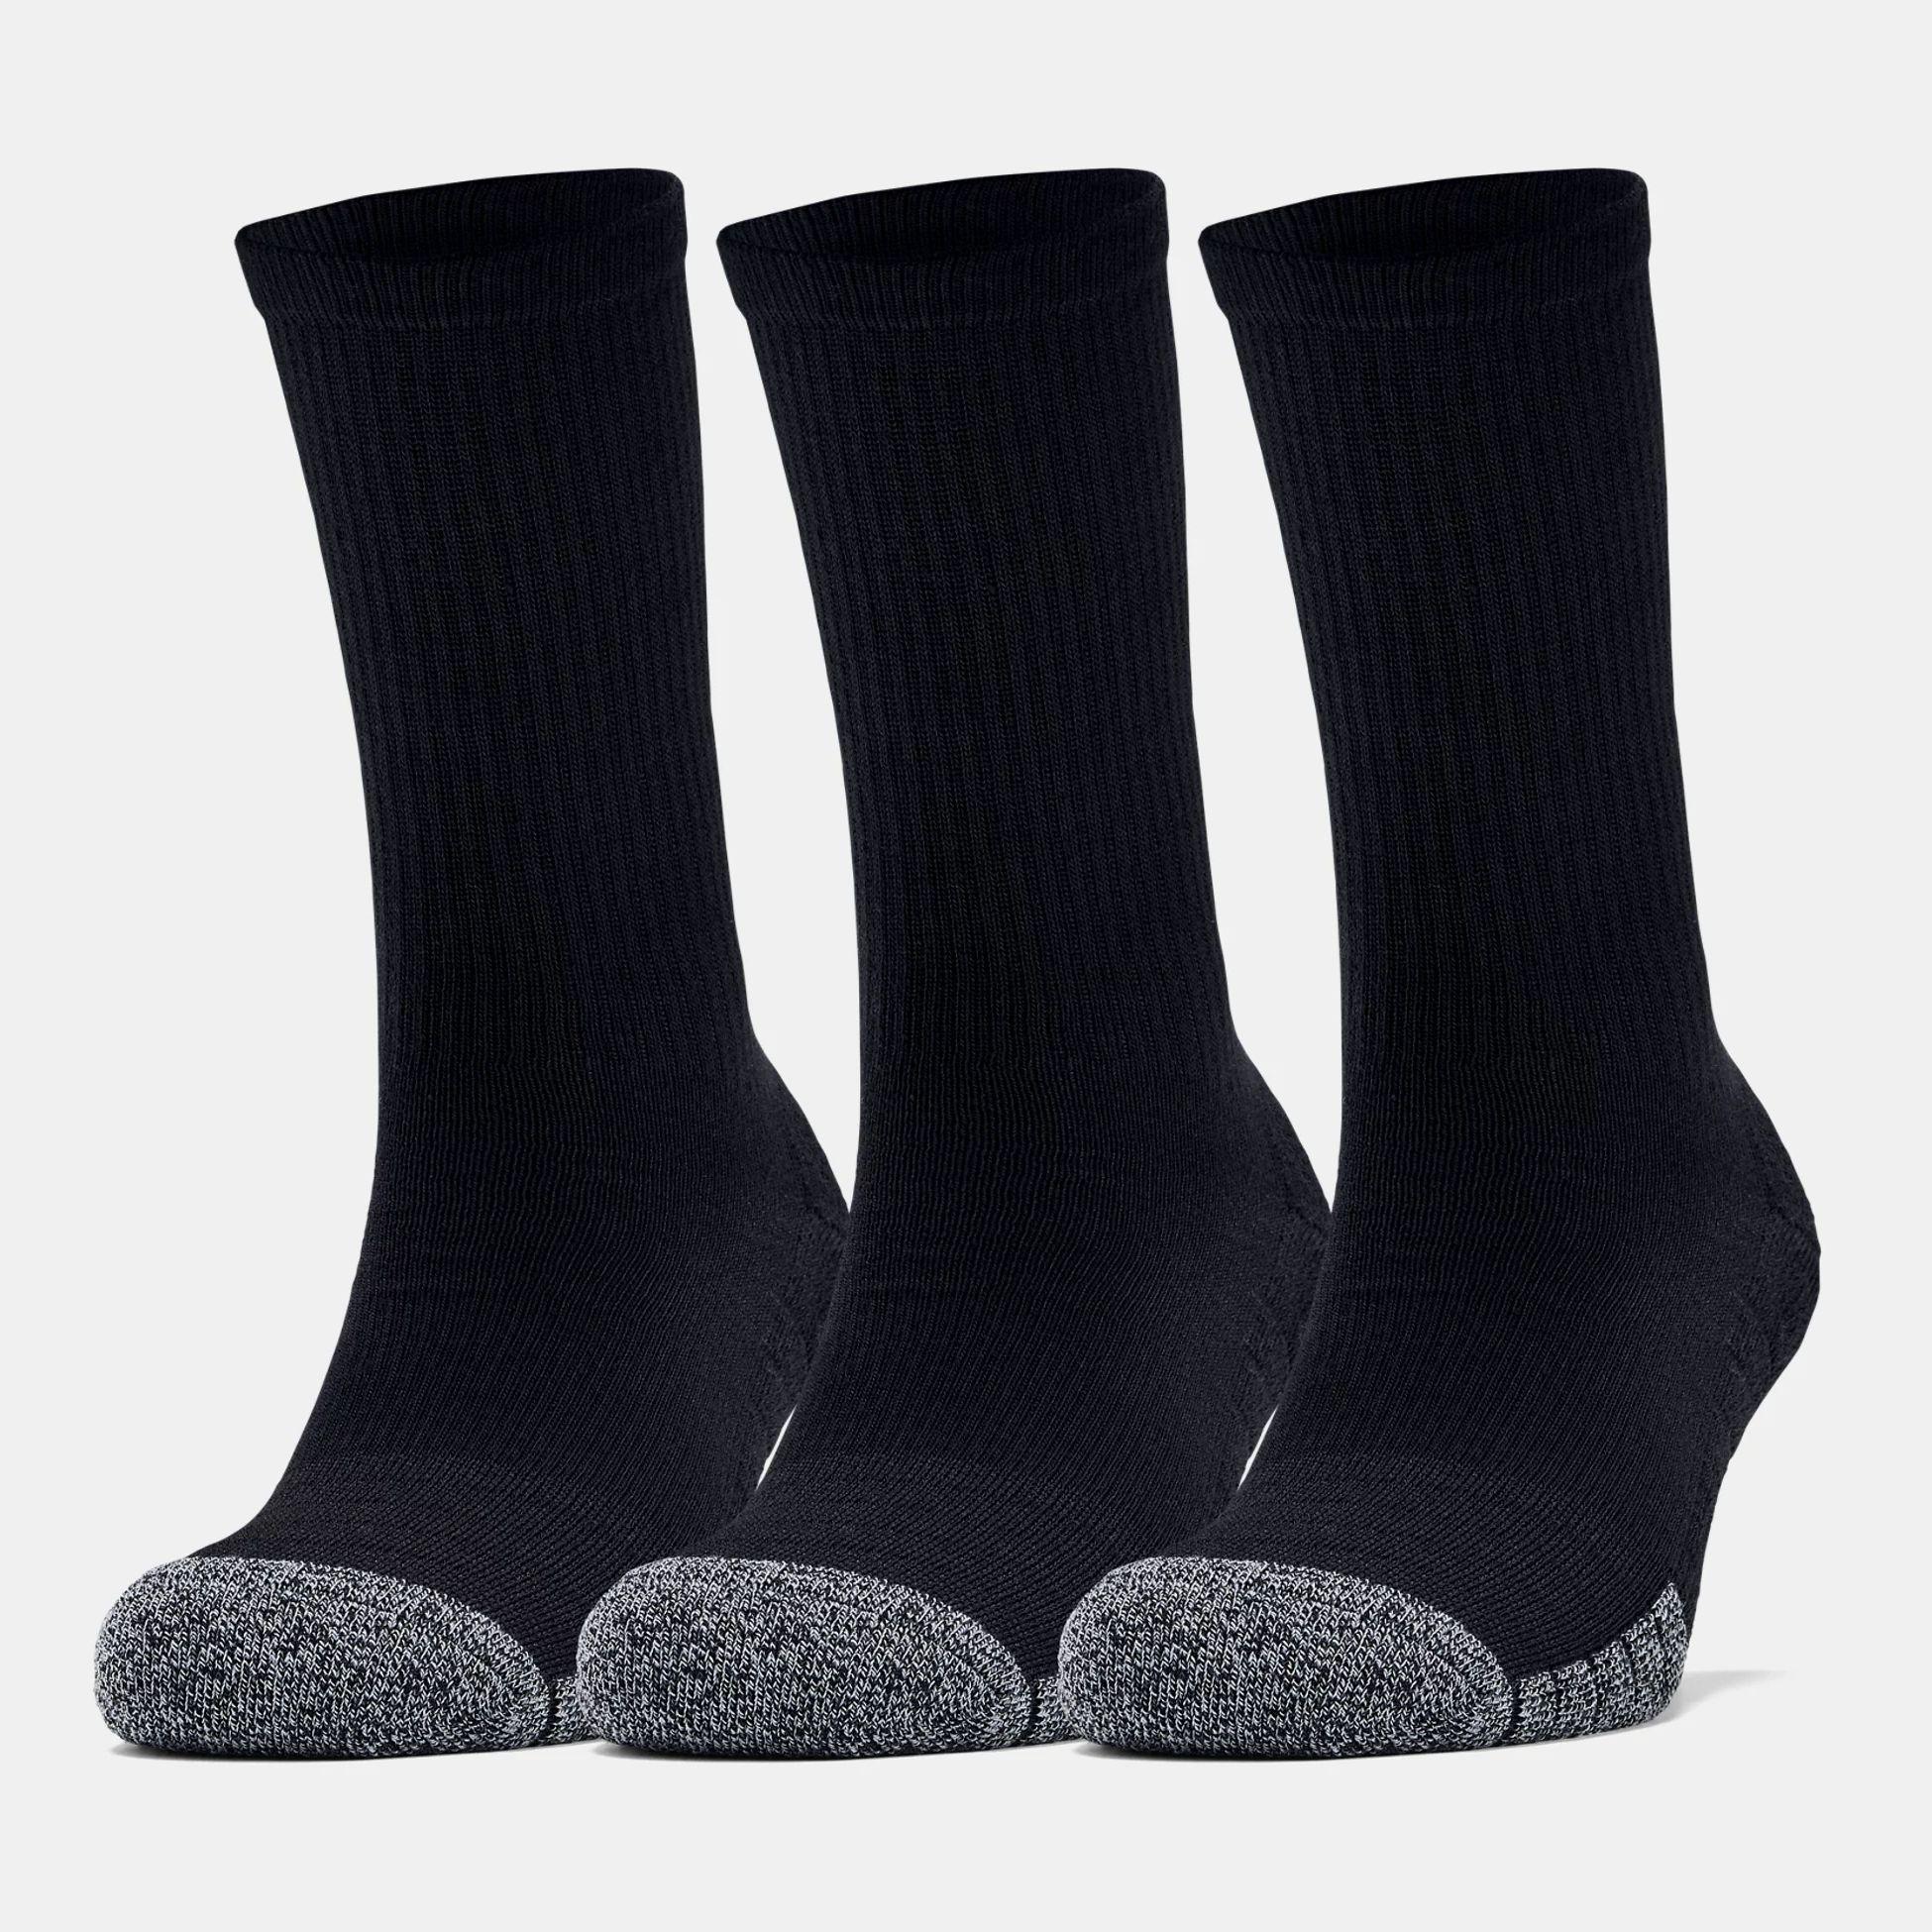 Accessories -  under armour HeatGear Crew Socks 3-Pack